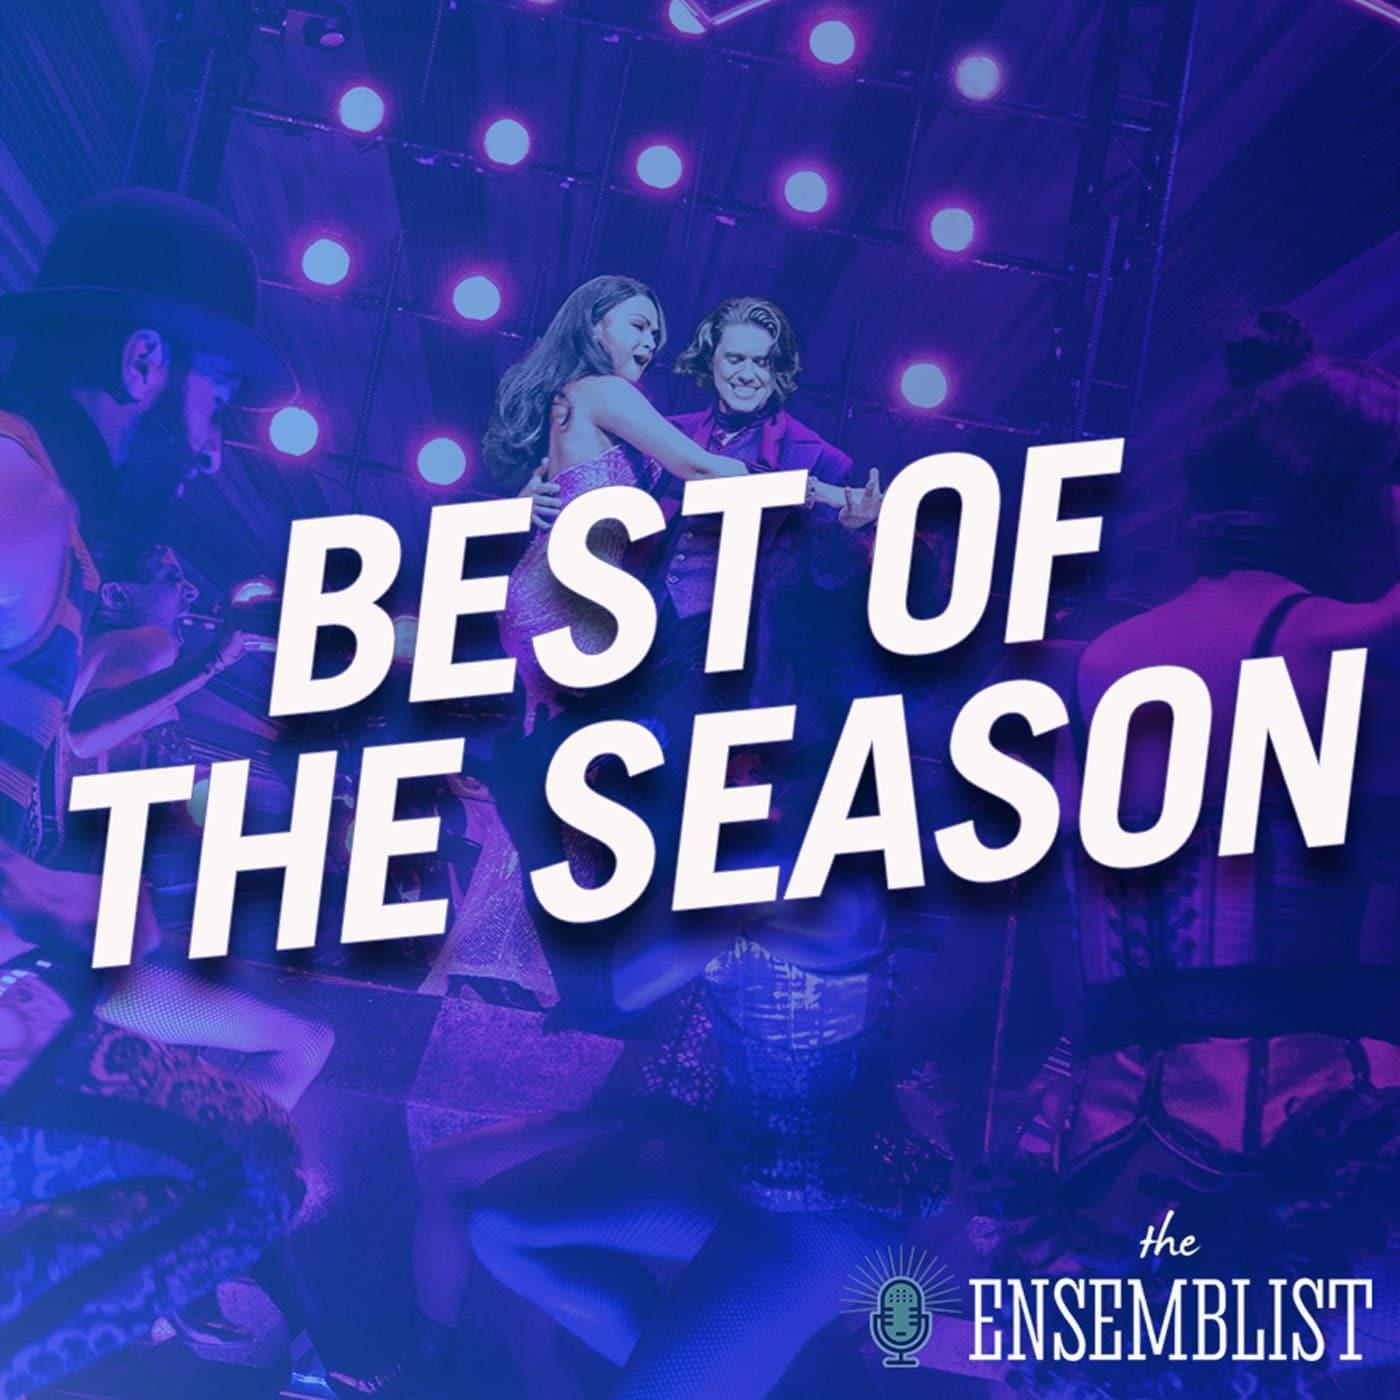 The Ensemblist - #280 - Best of the Season (feat. Ruthie Fierberg - Part 1)